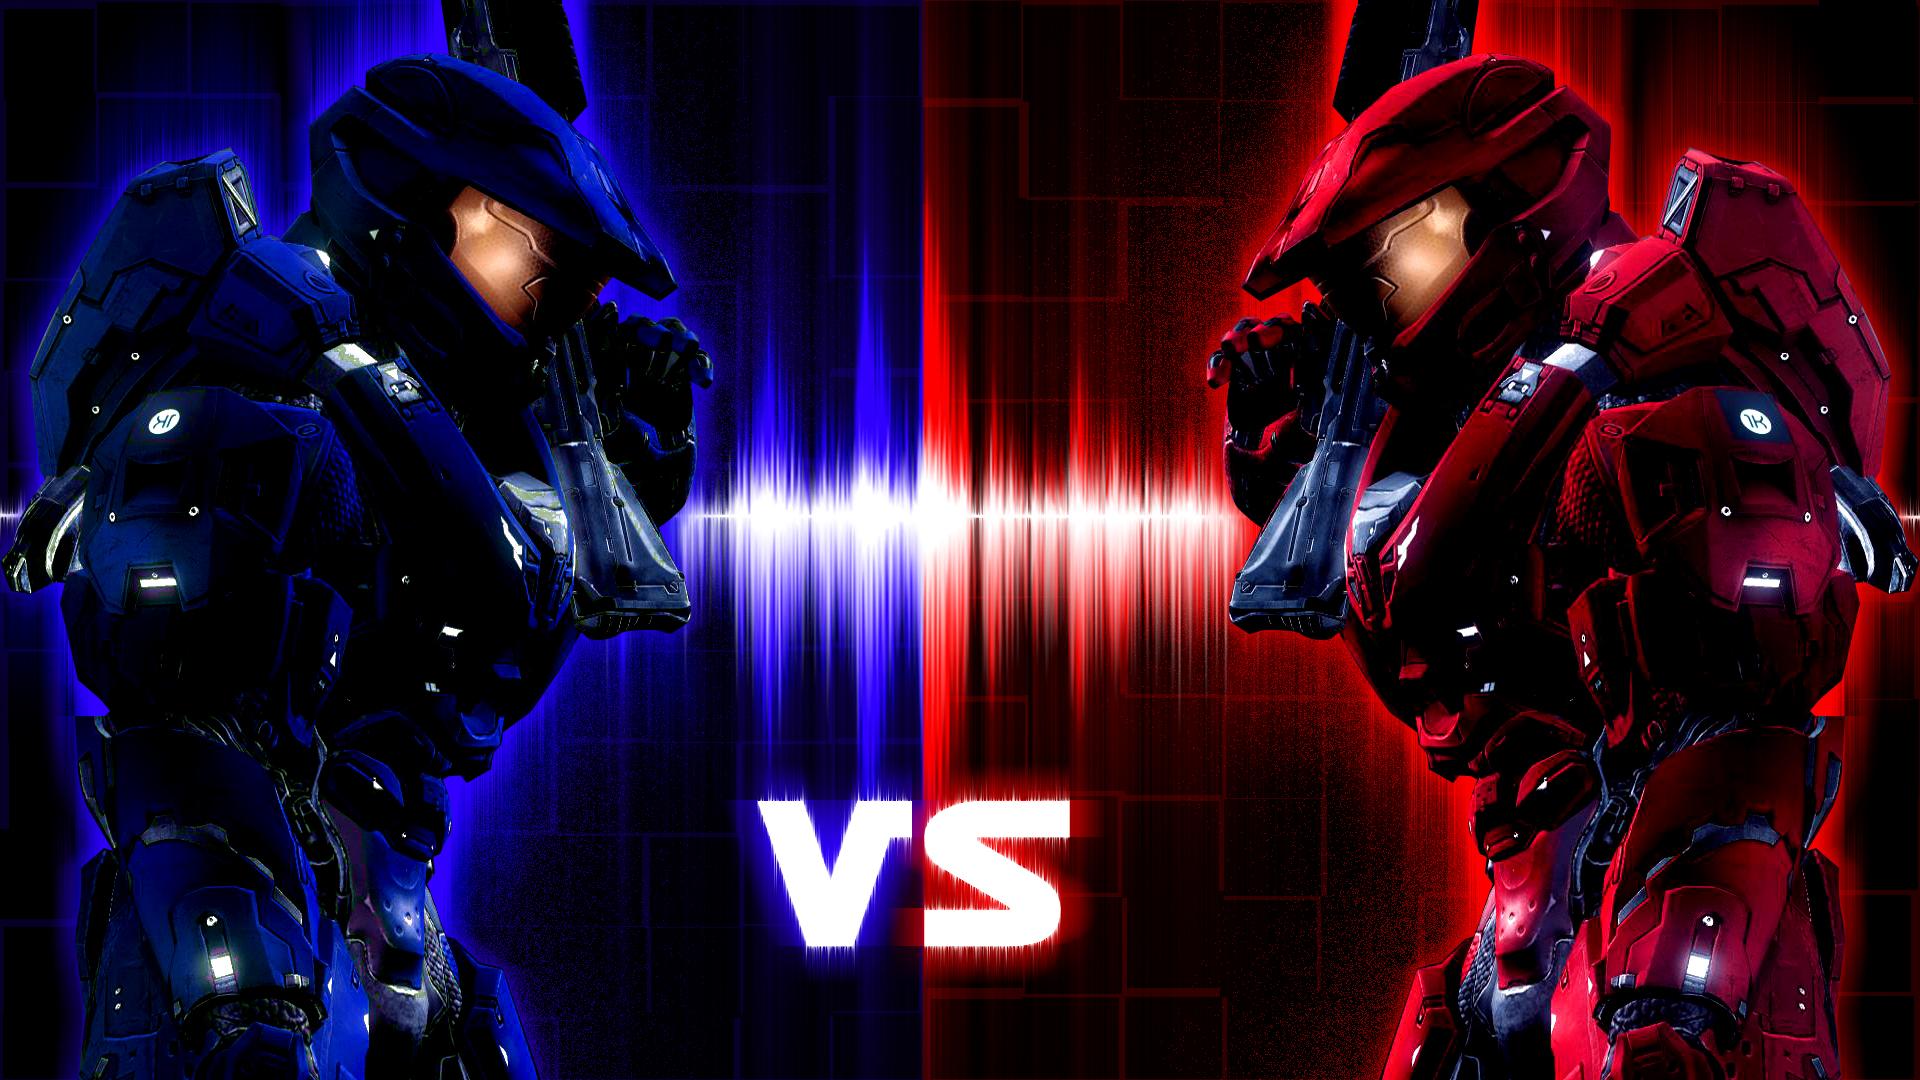 Red vs Blue Desktop Wallpapers | PixelsTalk.Net